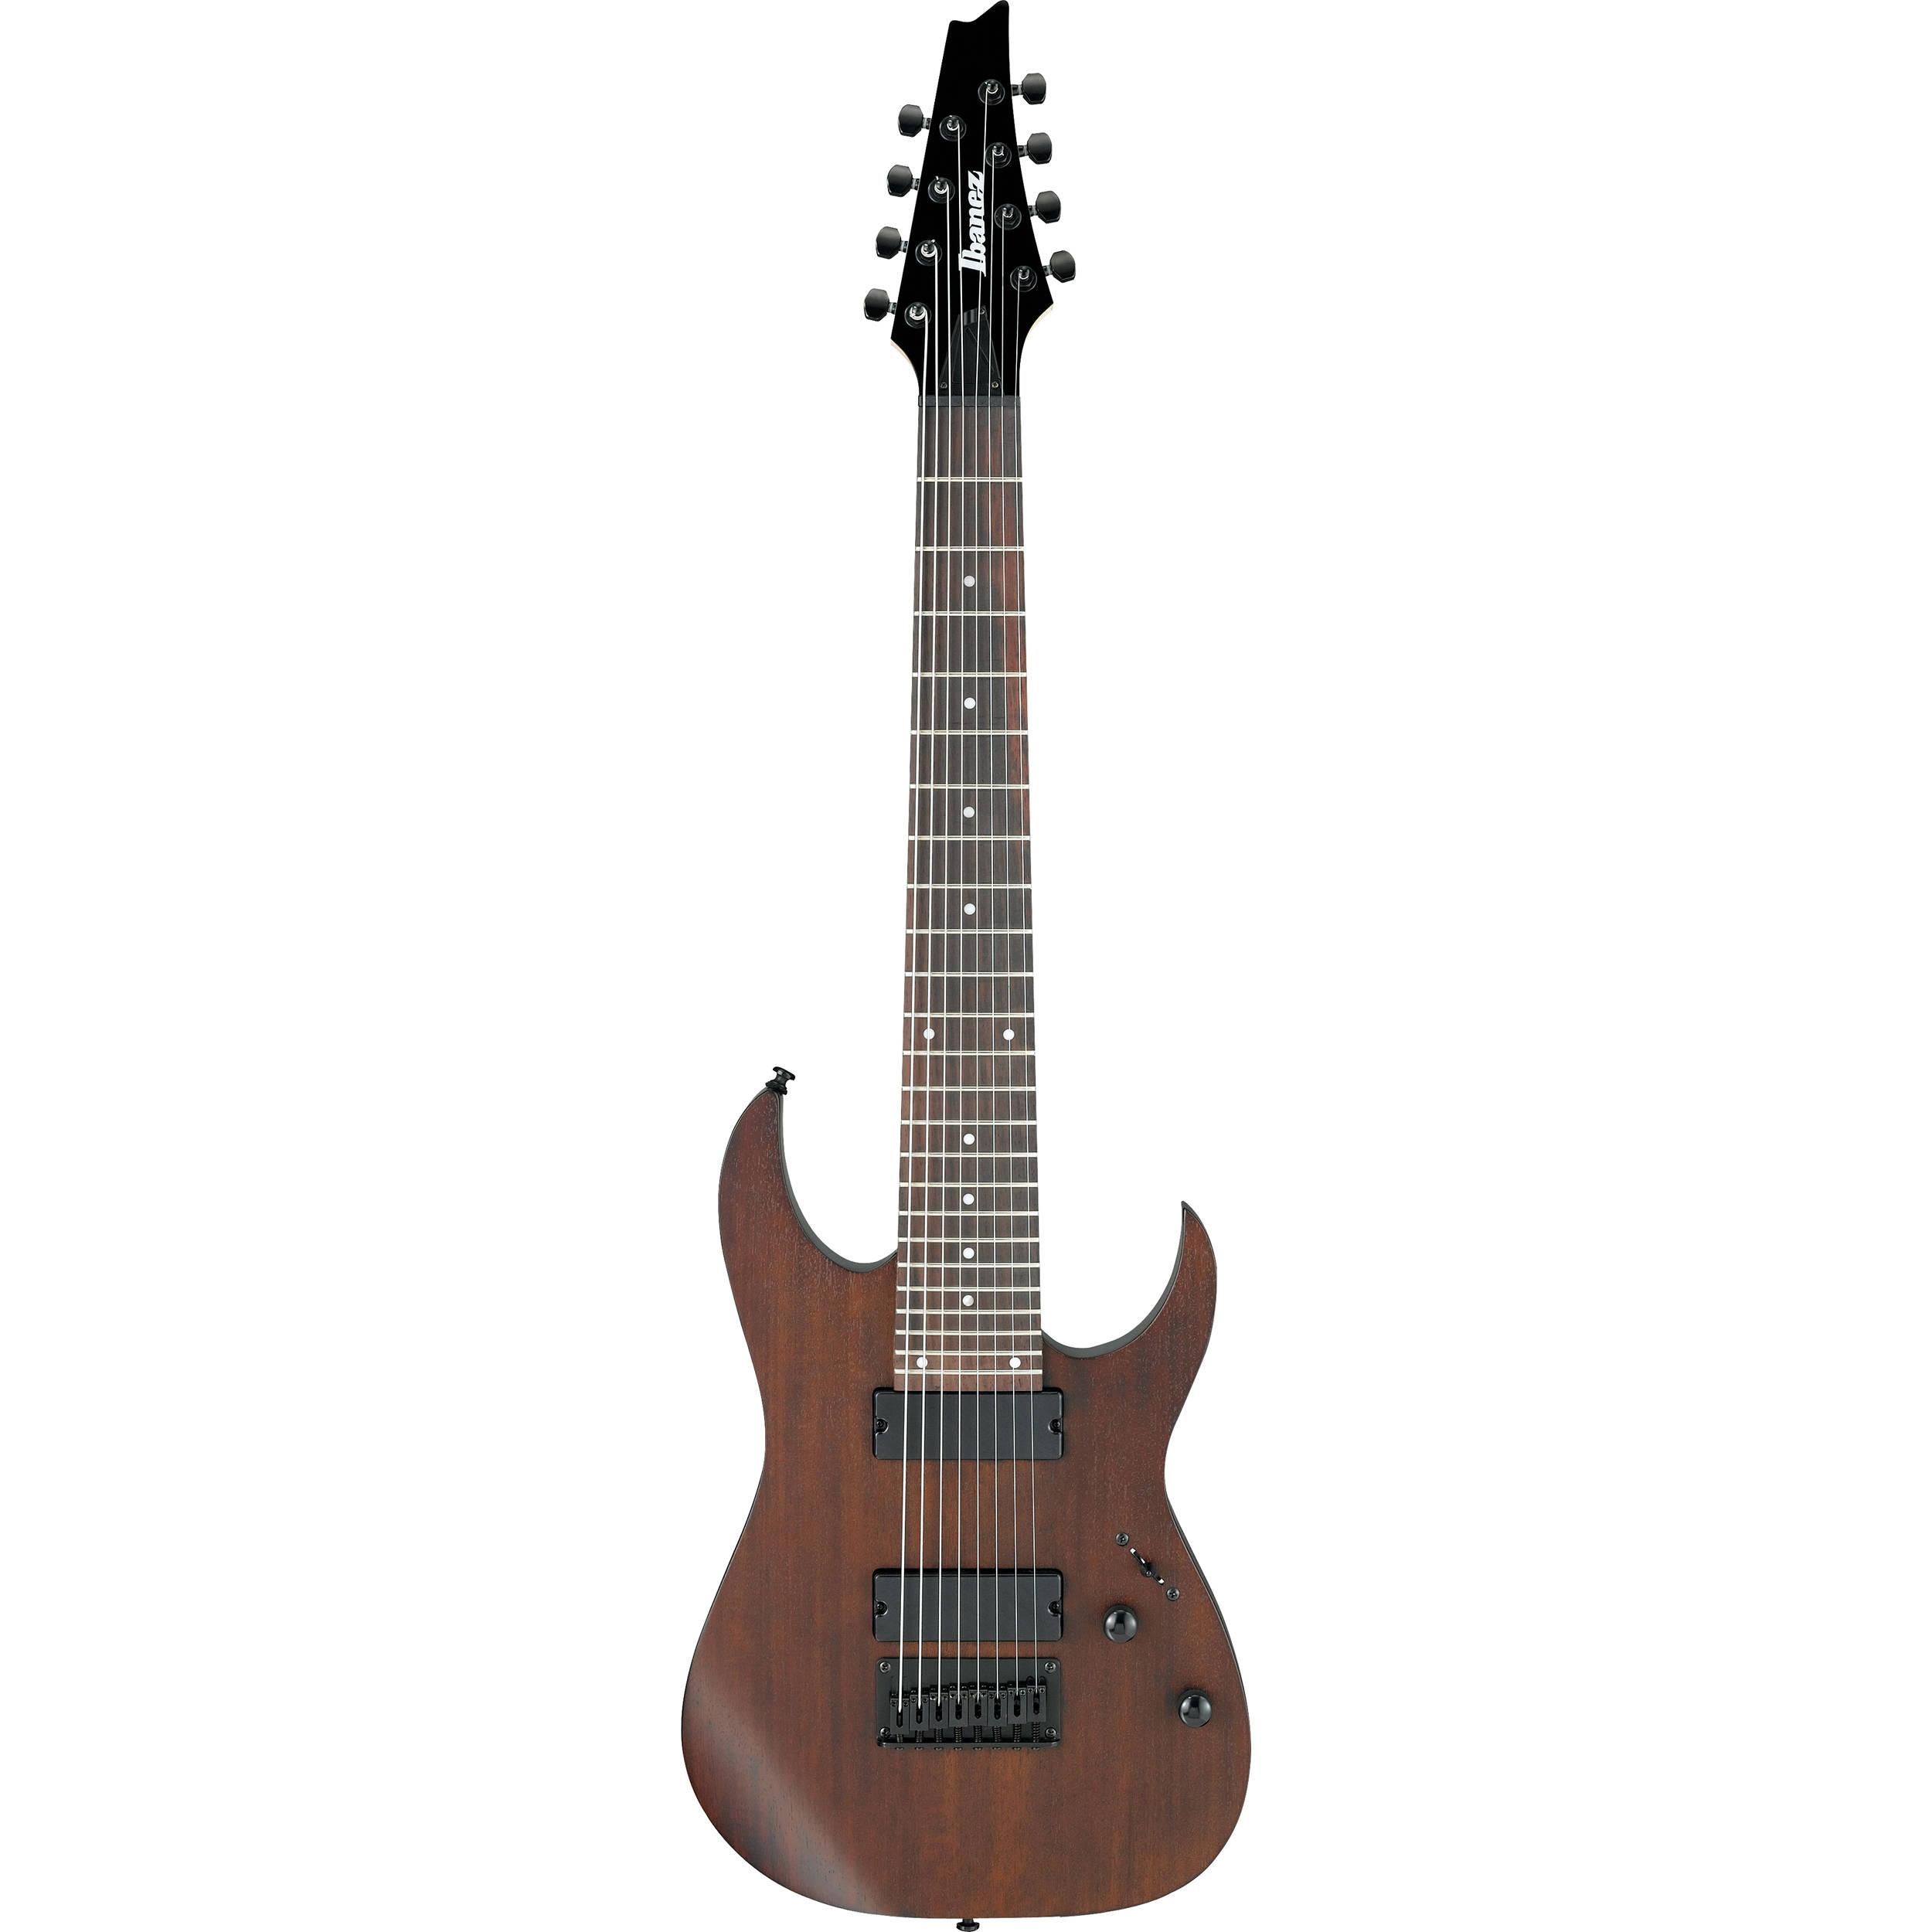 Ibanez Rga8 Wiring Diagram Trusted Diagrams Rg570 Rg8 7 String Guitar 8 Electric